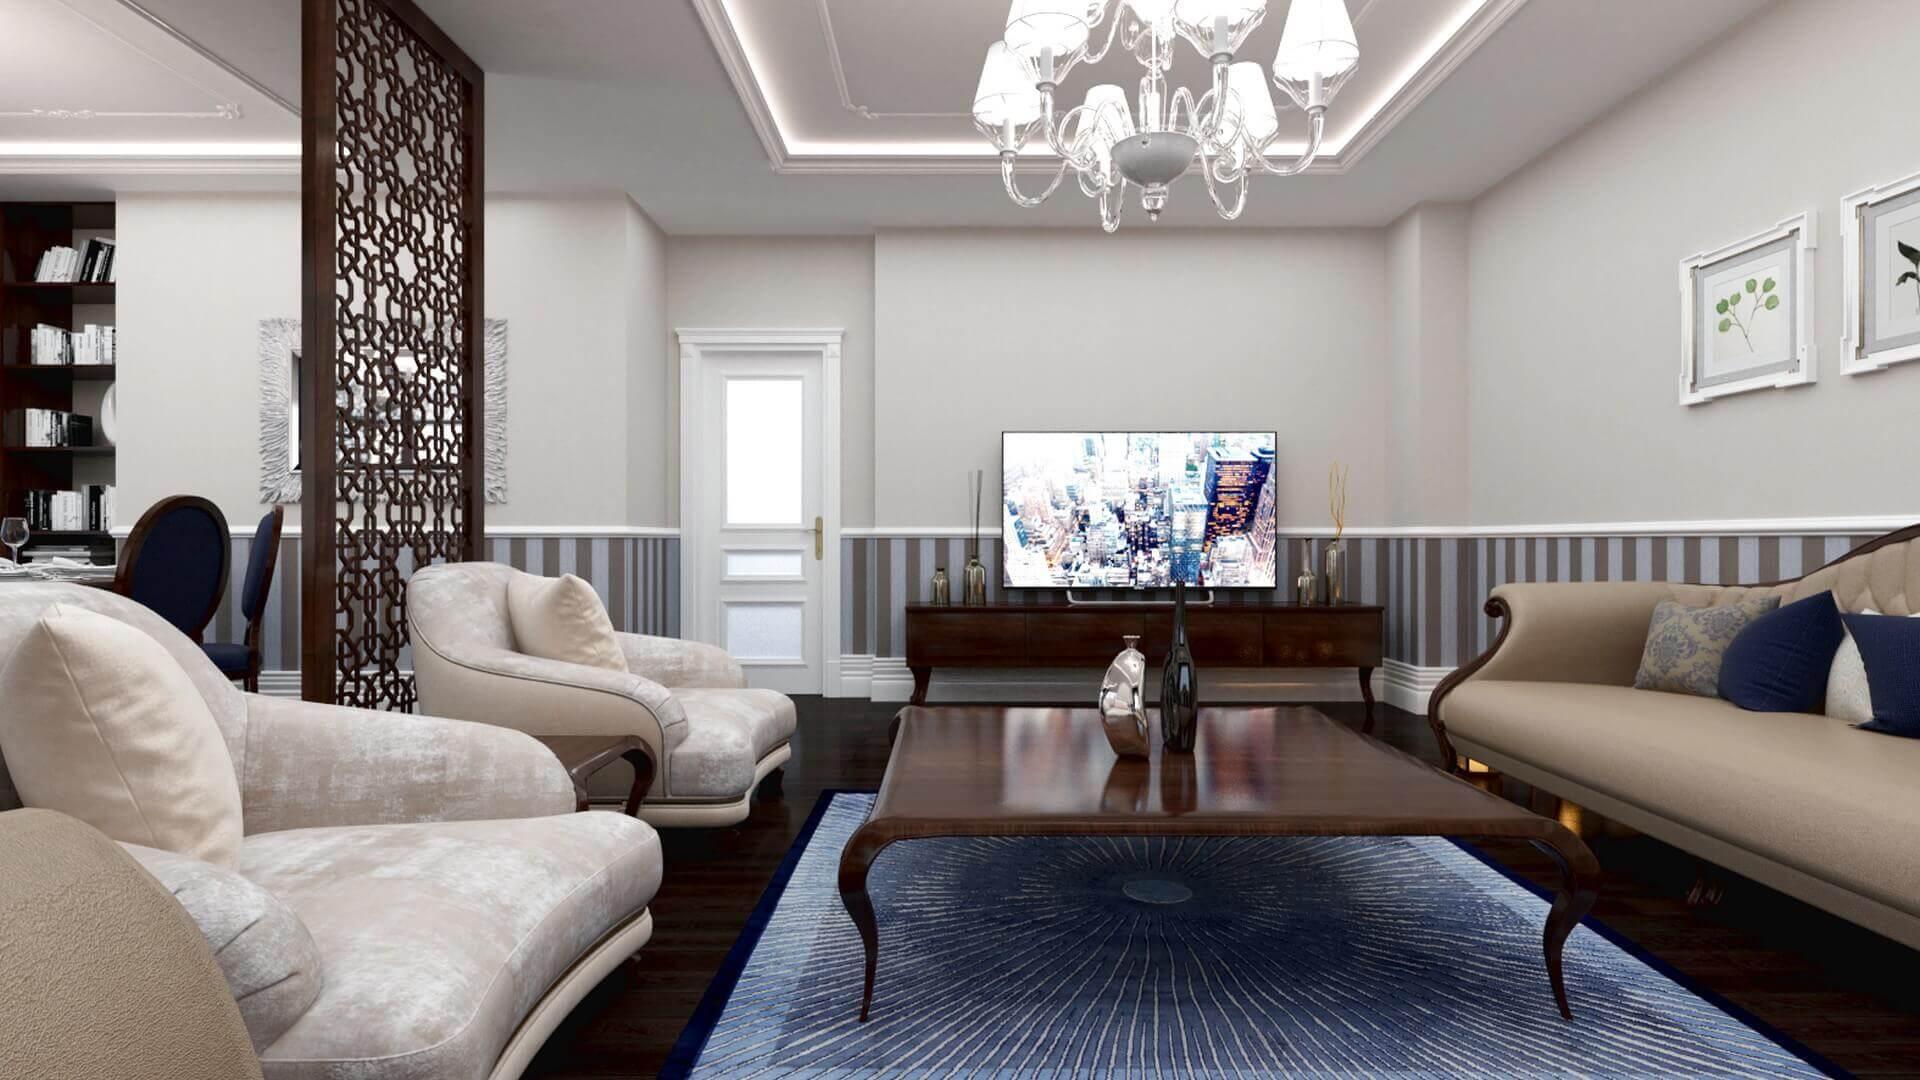 Ballıkpınar 3433 Aslan House Residential